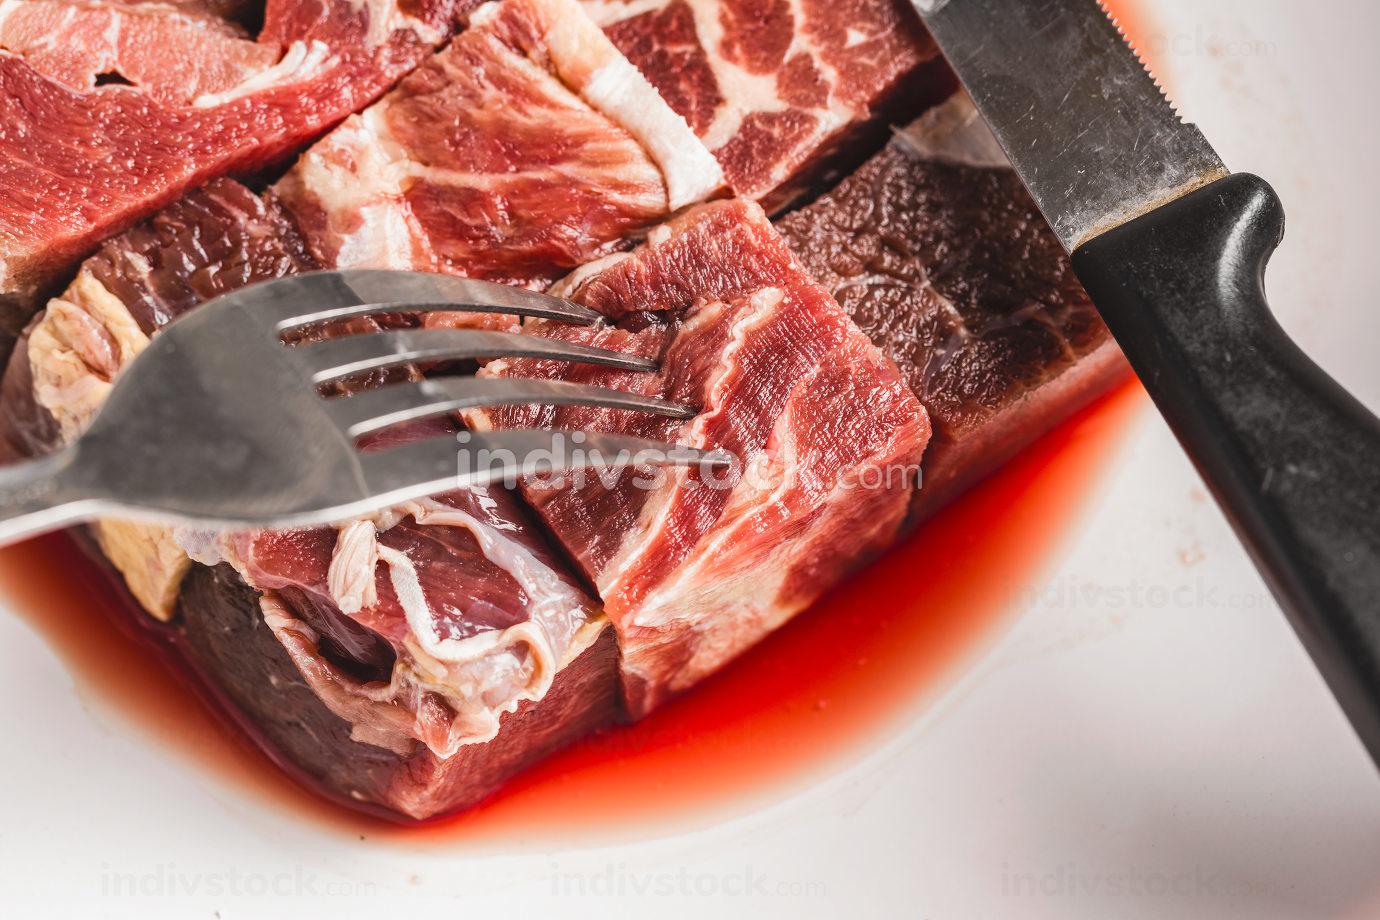 Raw beef steak nice photo